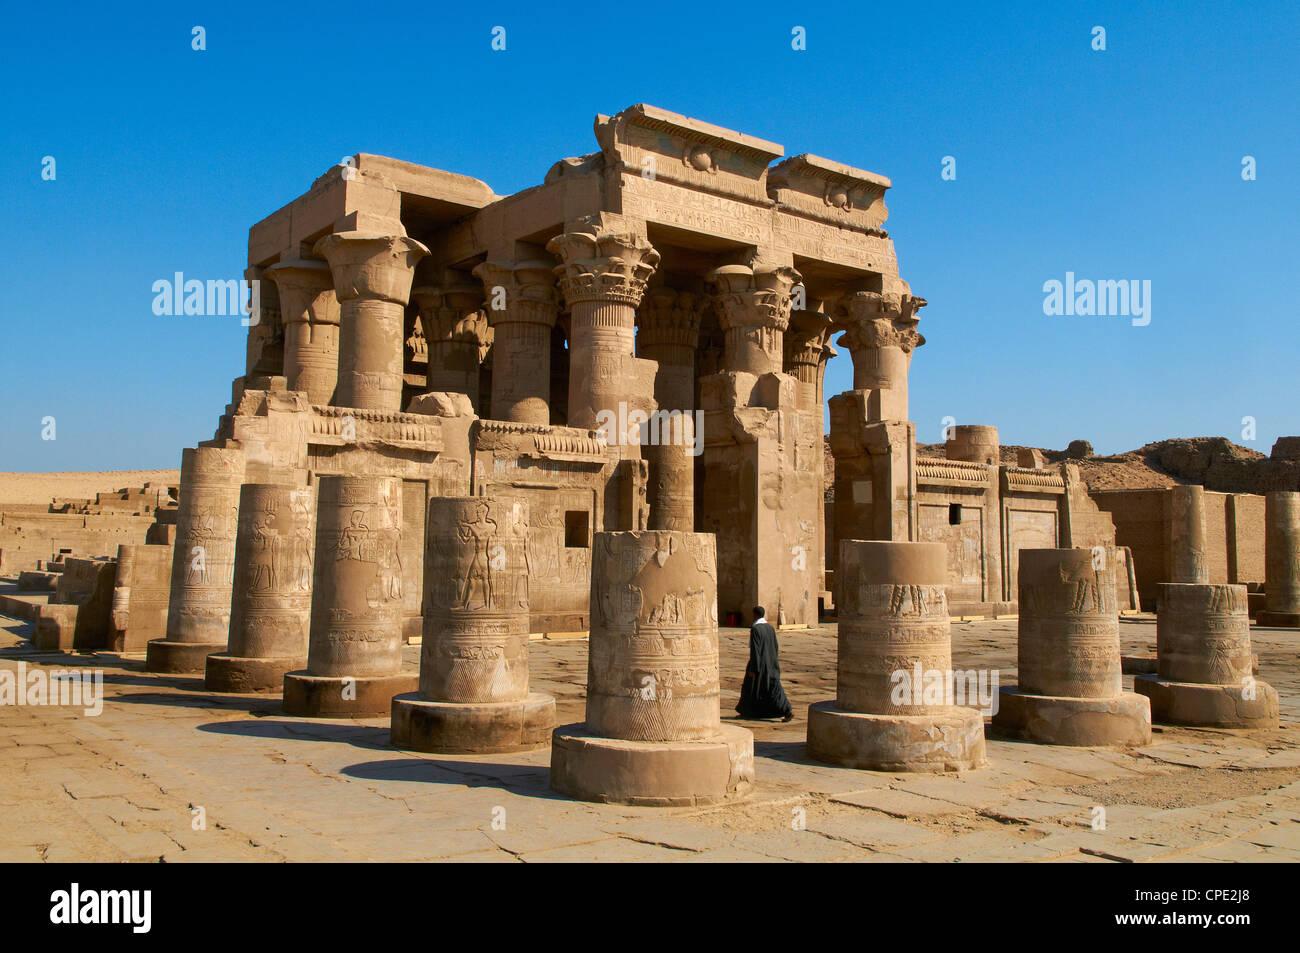 Tempio di Sobek e Haroeris, Kom Ombo, Egitto, Africa Settentrionale, Africa Immagini Stock